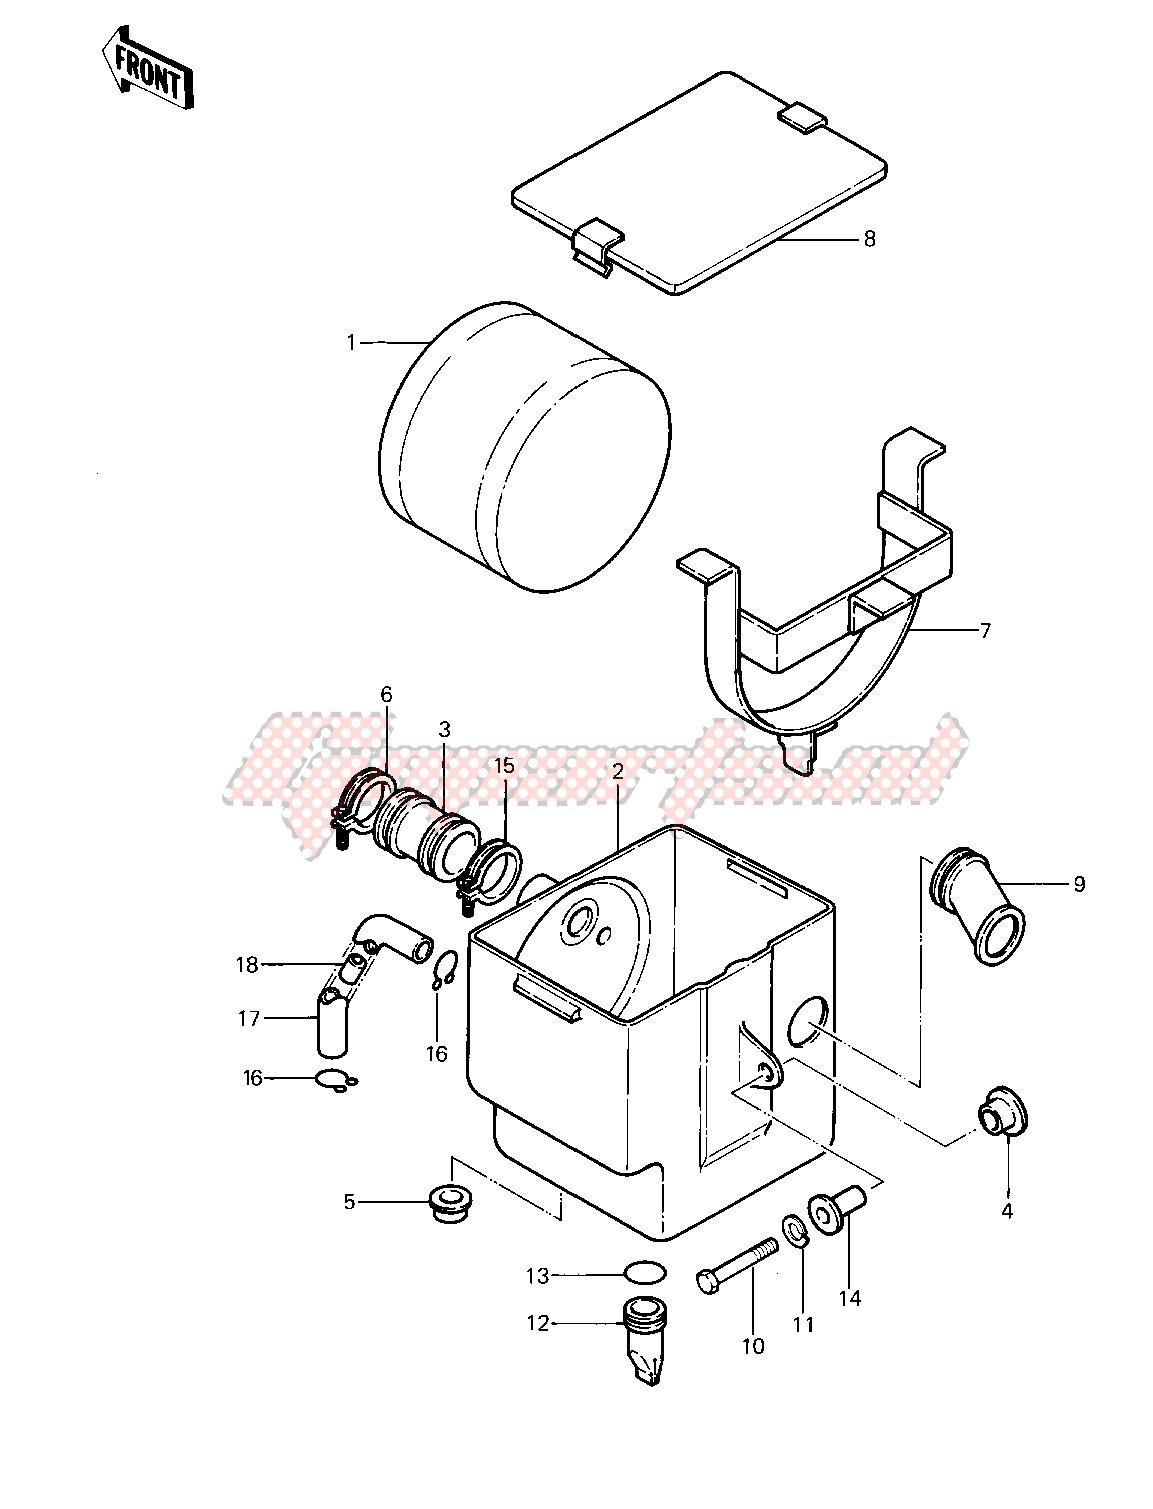 AIR CLEANER -- 83 KLT200-A4_A4A- - image